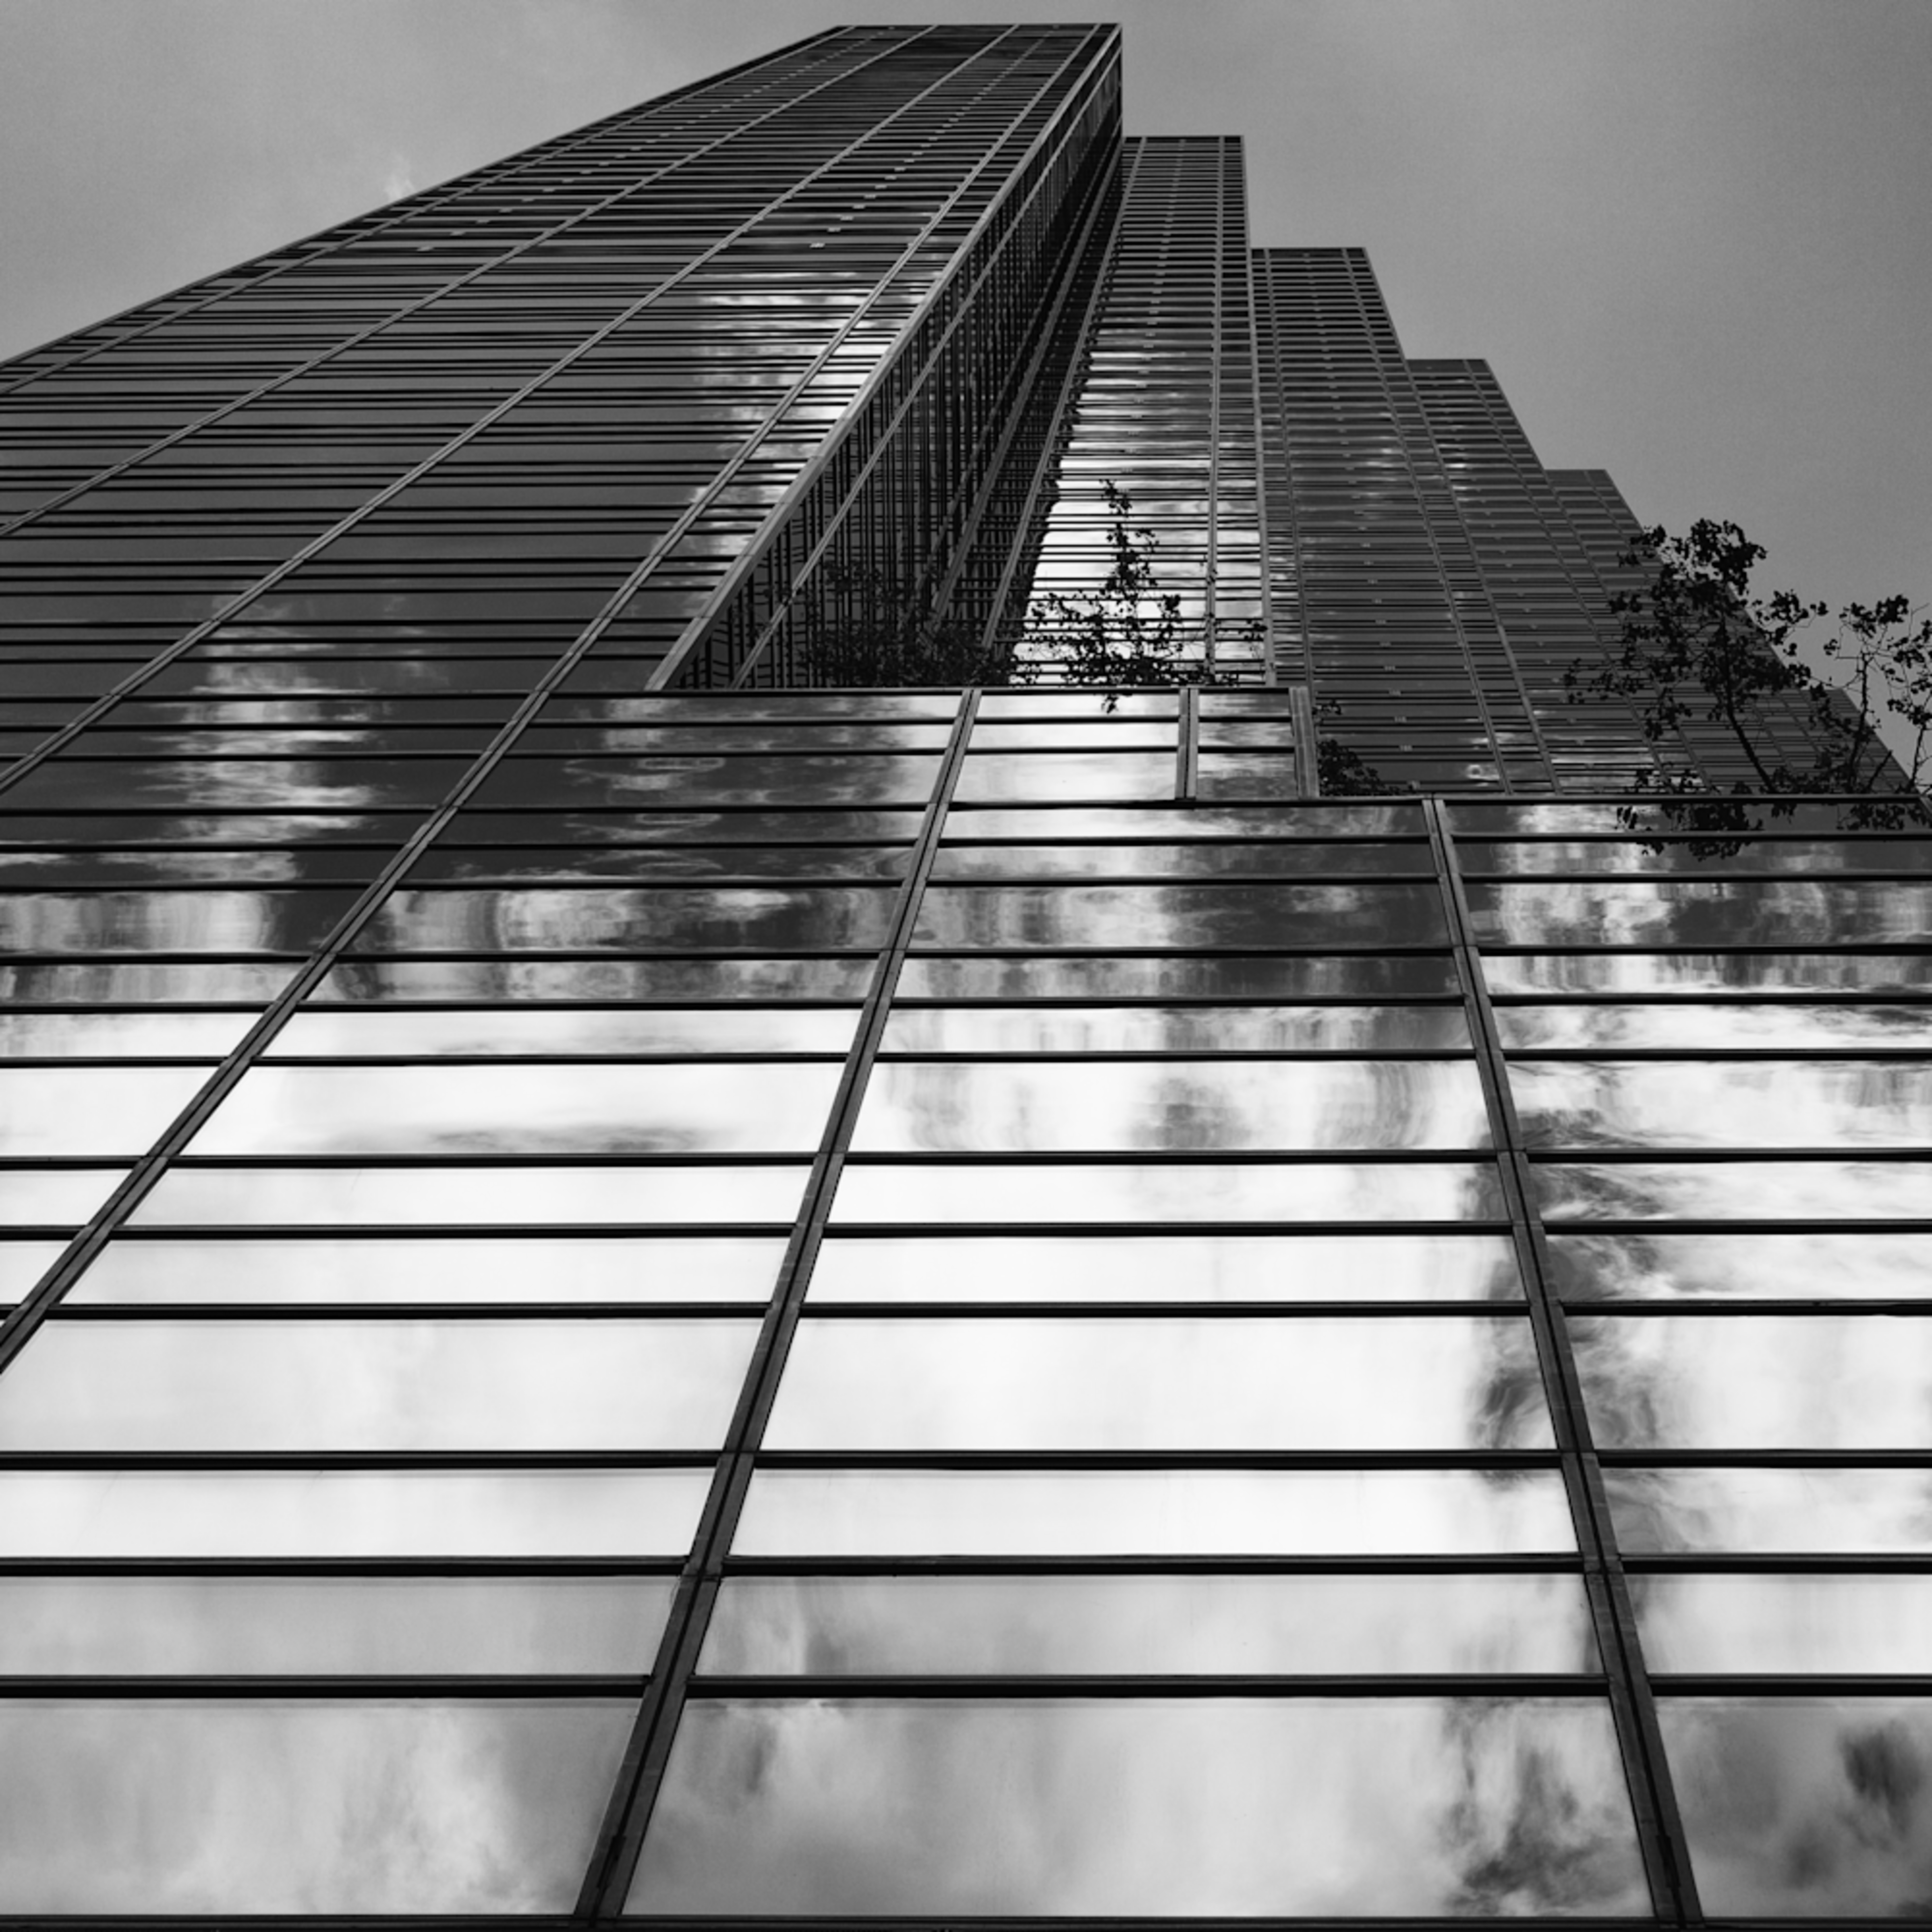 Mbp new york 20120924 1818 tlkdzb